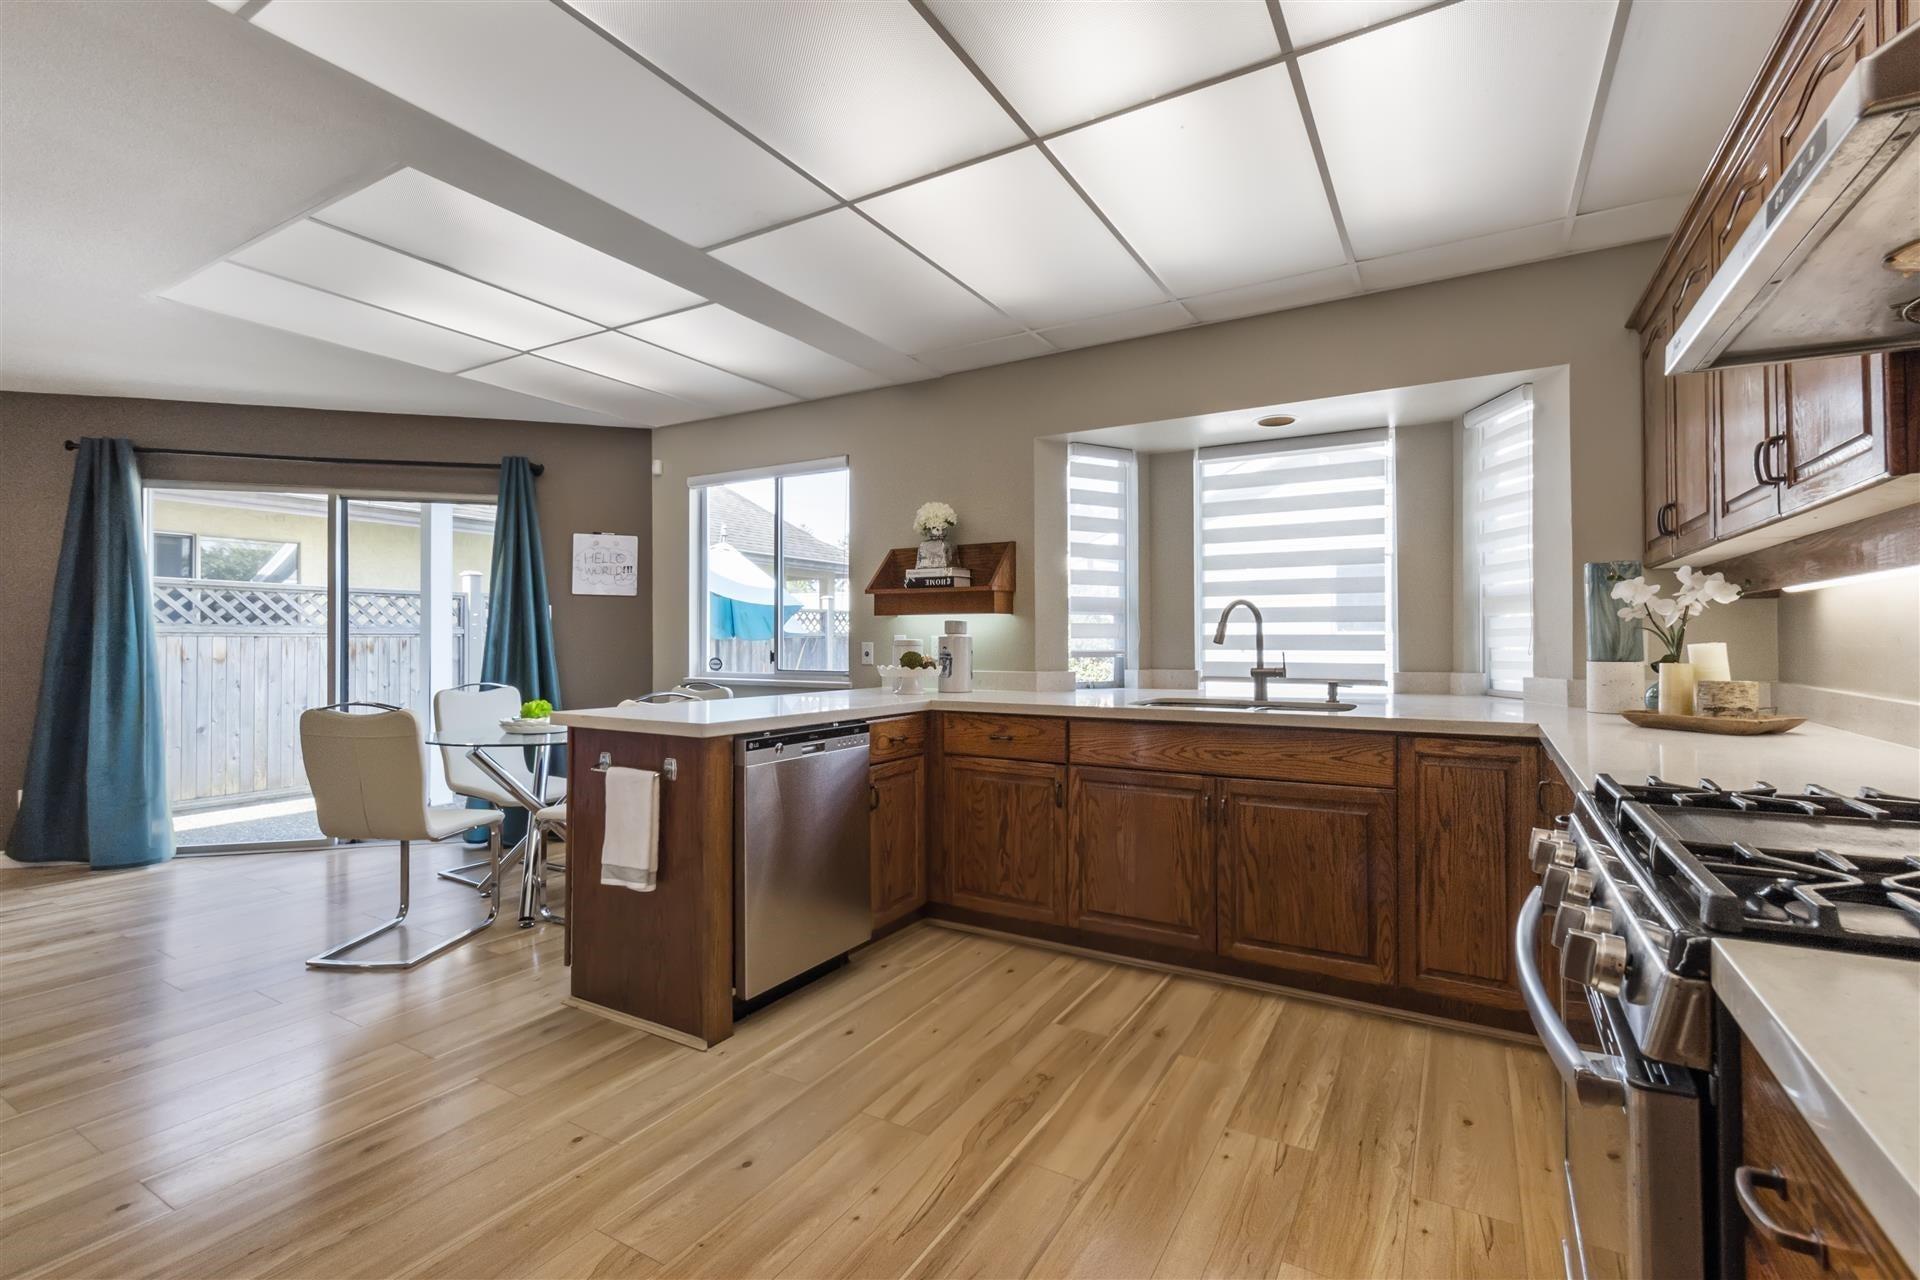 3631 GEORGIA STREET - Steveston Village House/Single Family for sale, 3 Bedrooms (R2623894) - #7